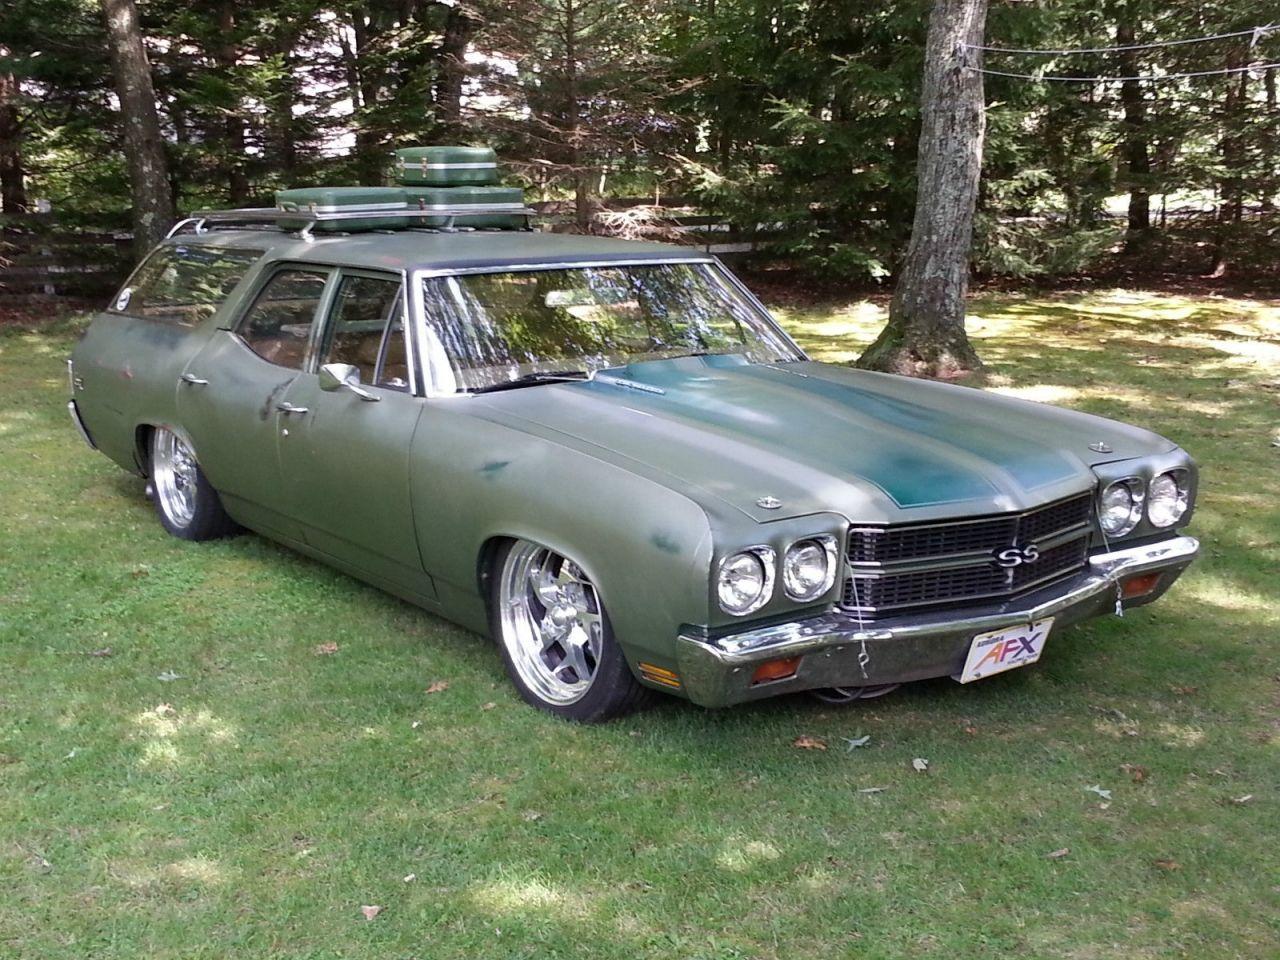 1970 Chevrolet Chevelle Wagon nomad | Chevrolet chevelle ...